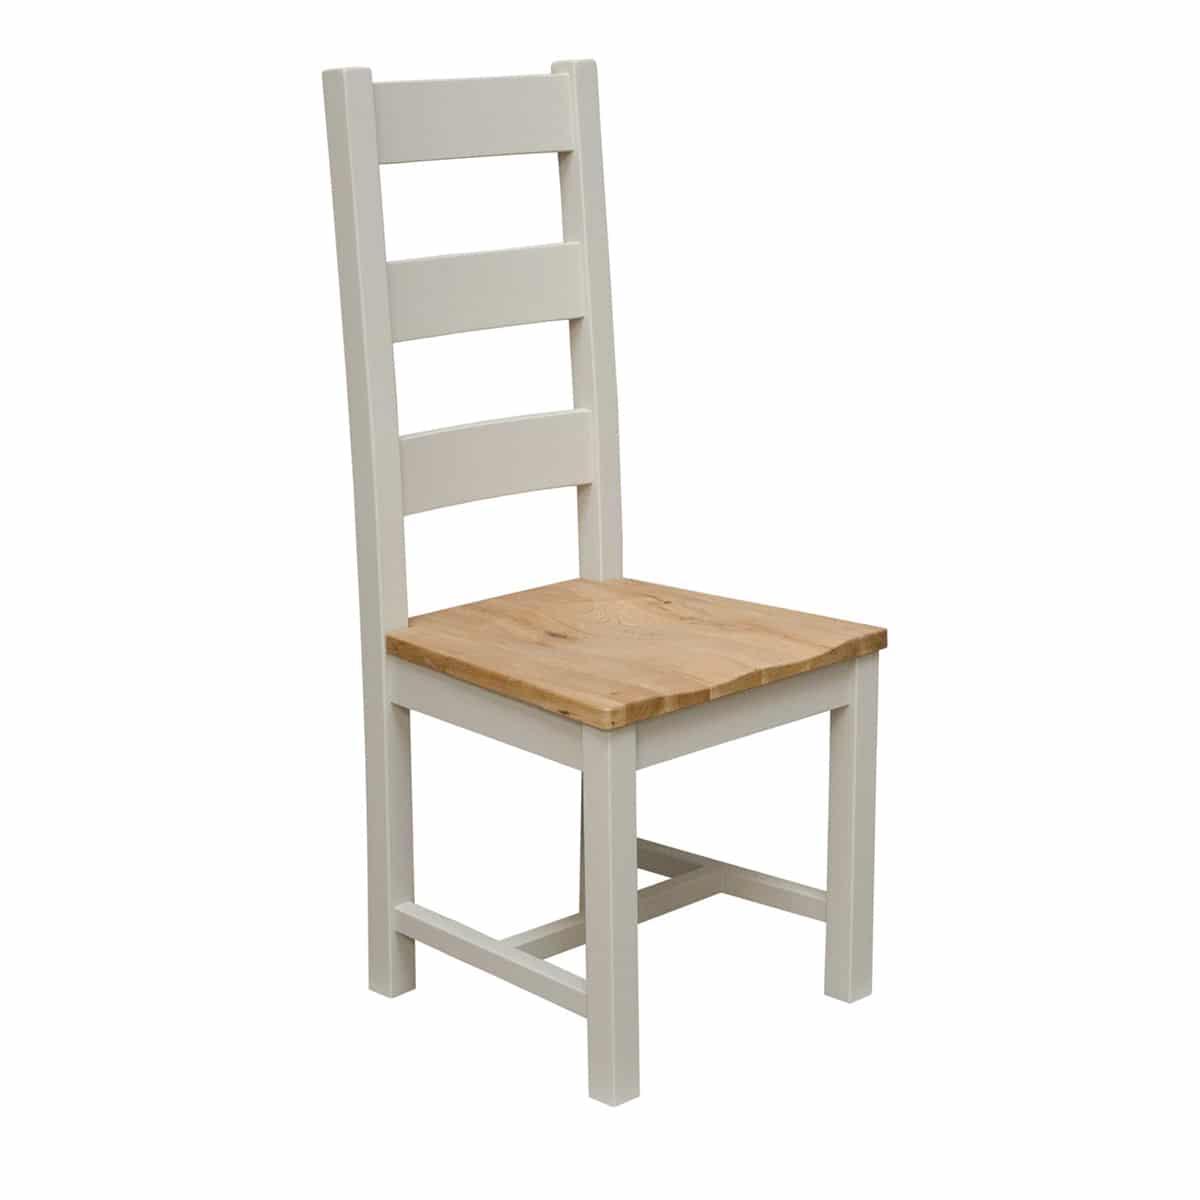 Wessex Painted Ladderback Chair - WSXPLADDER